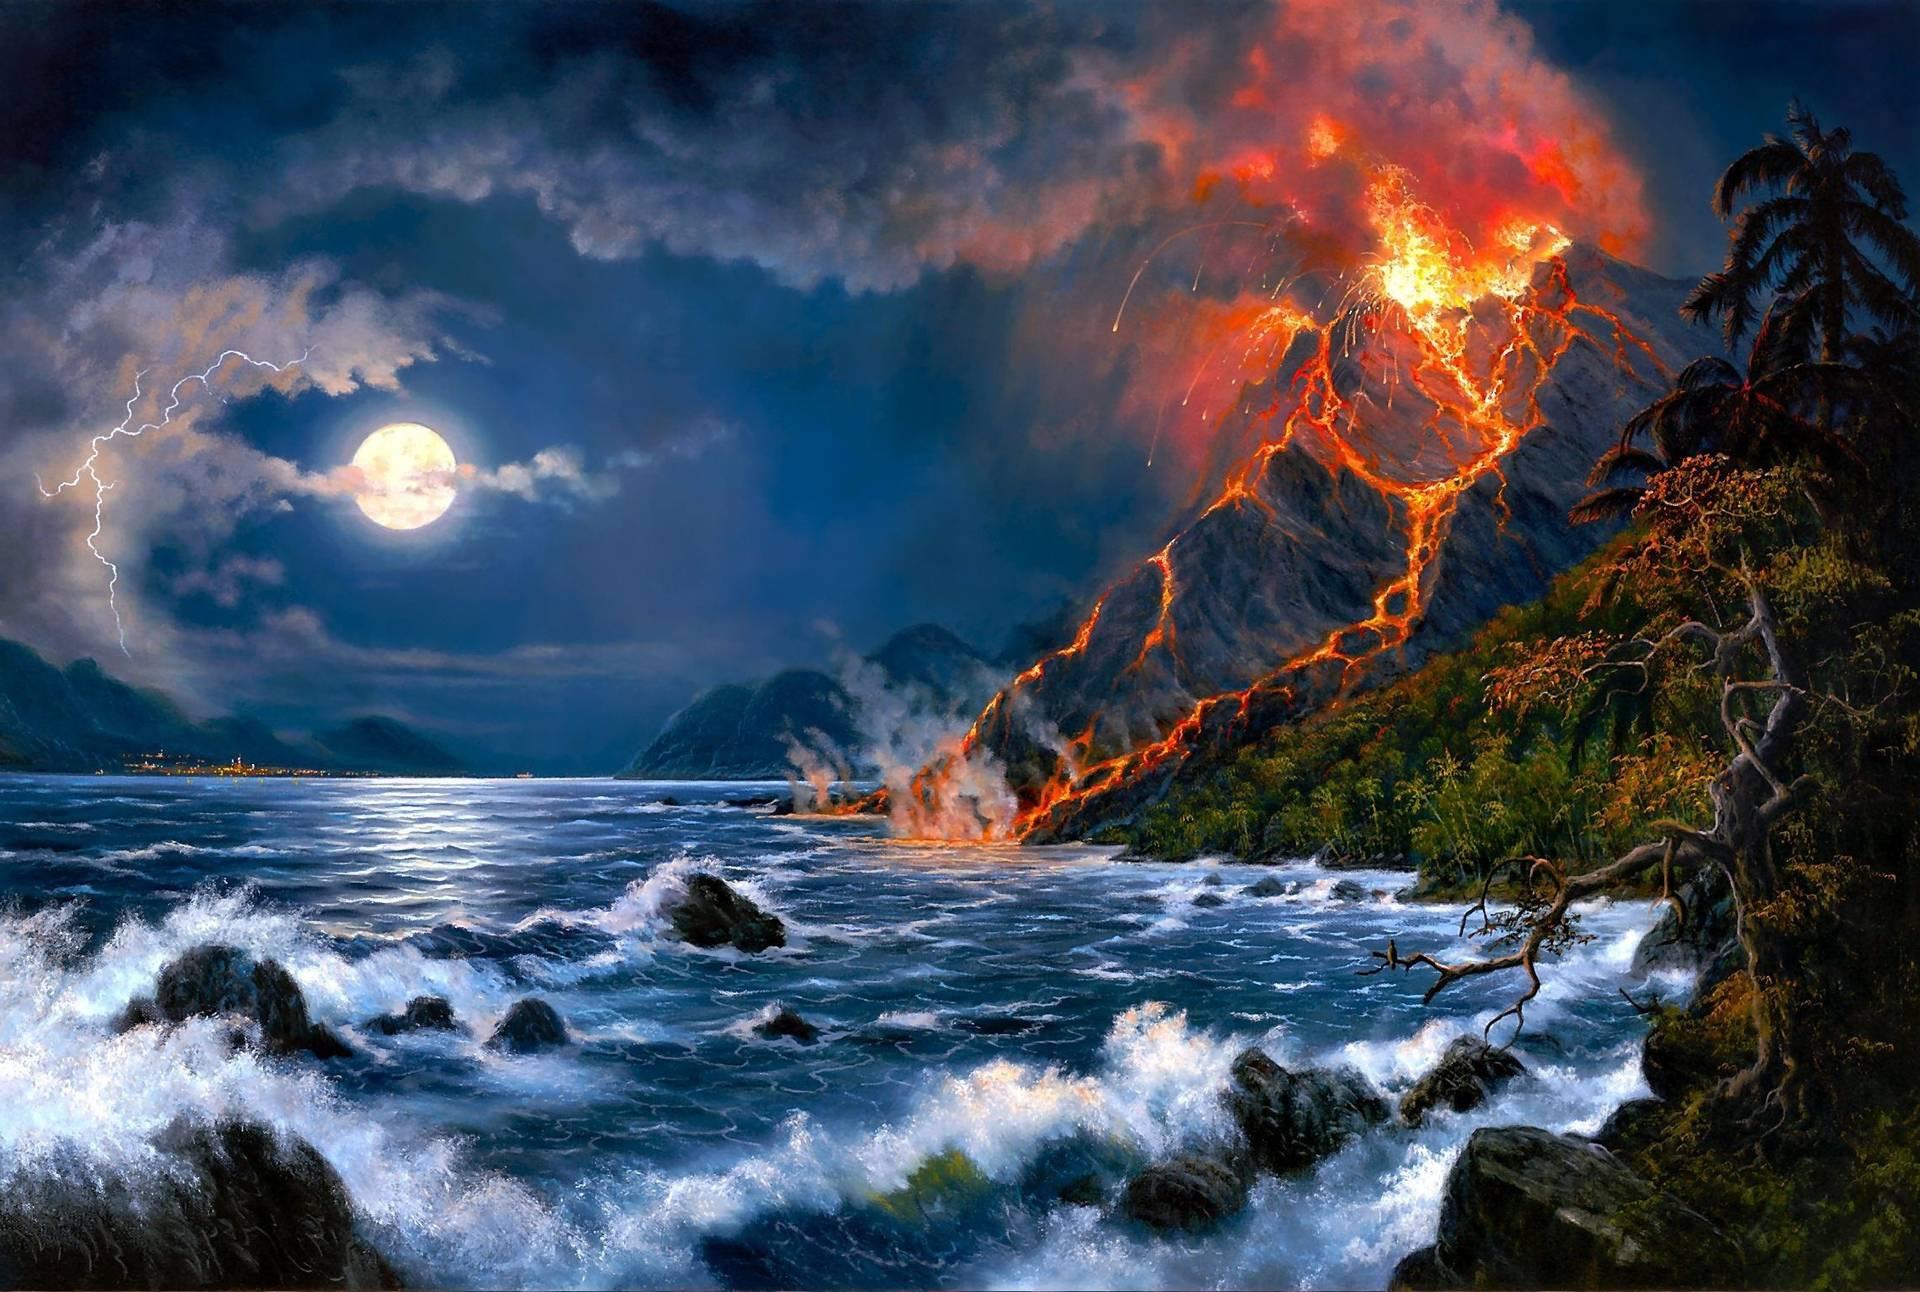 wallpaper hd volcano eruption - photo #31